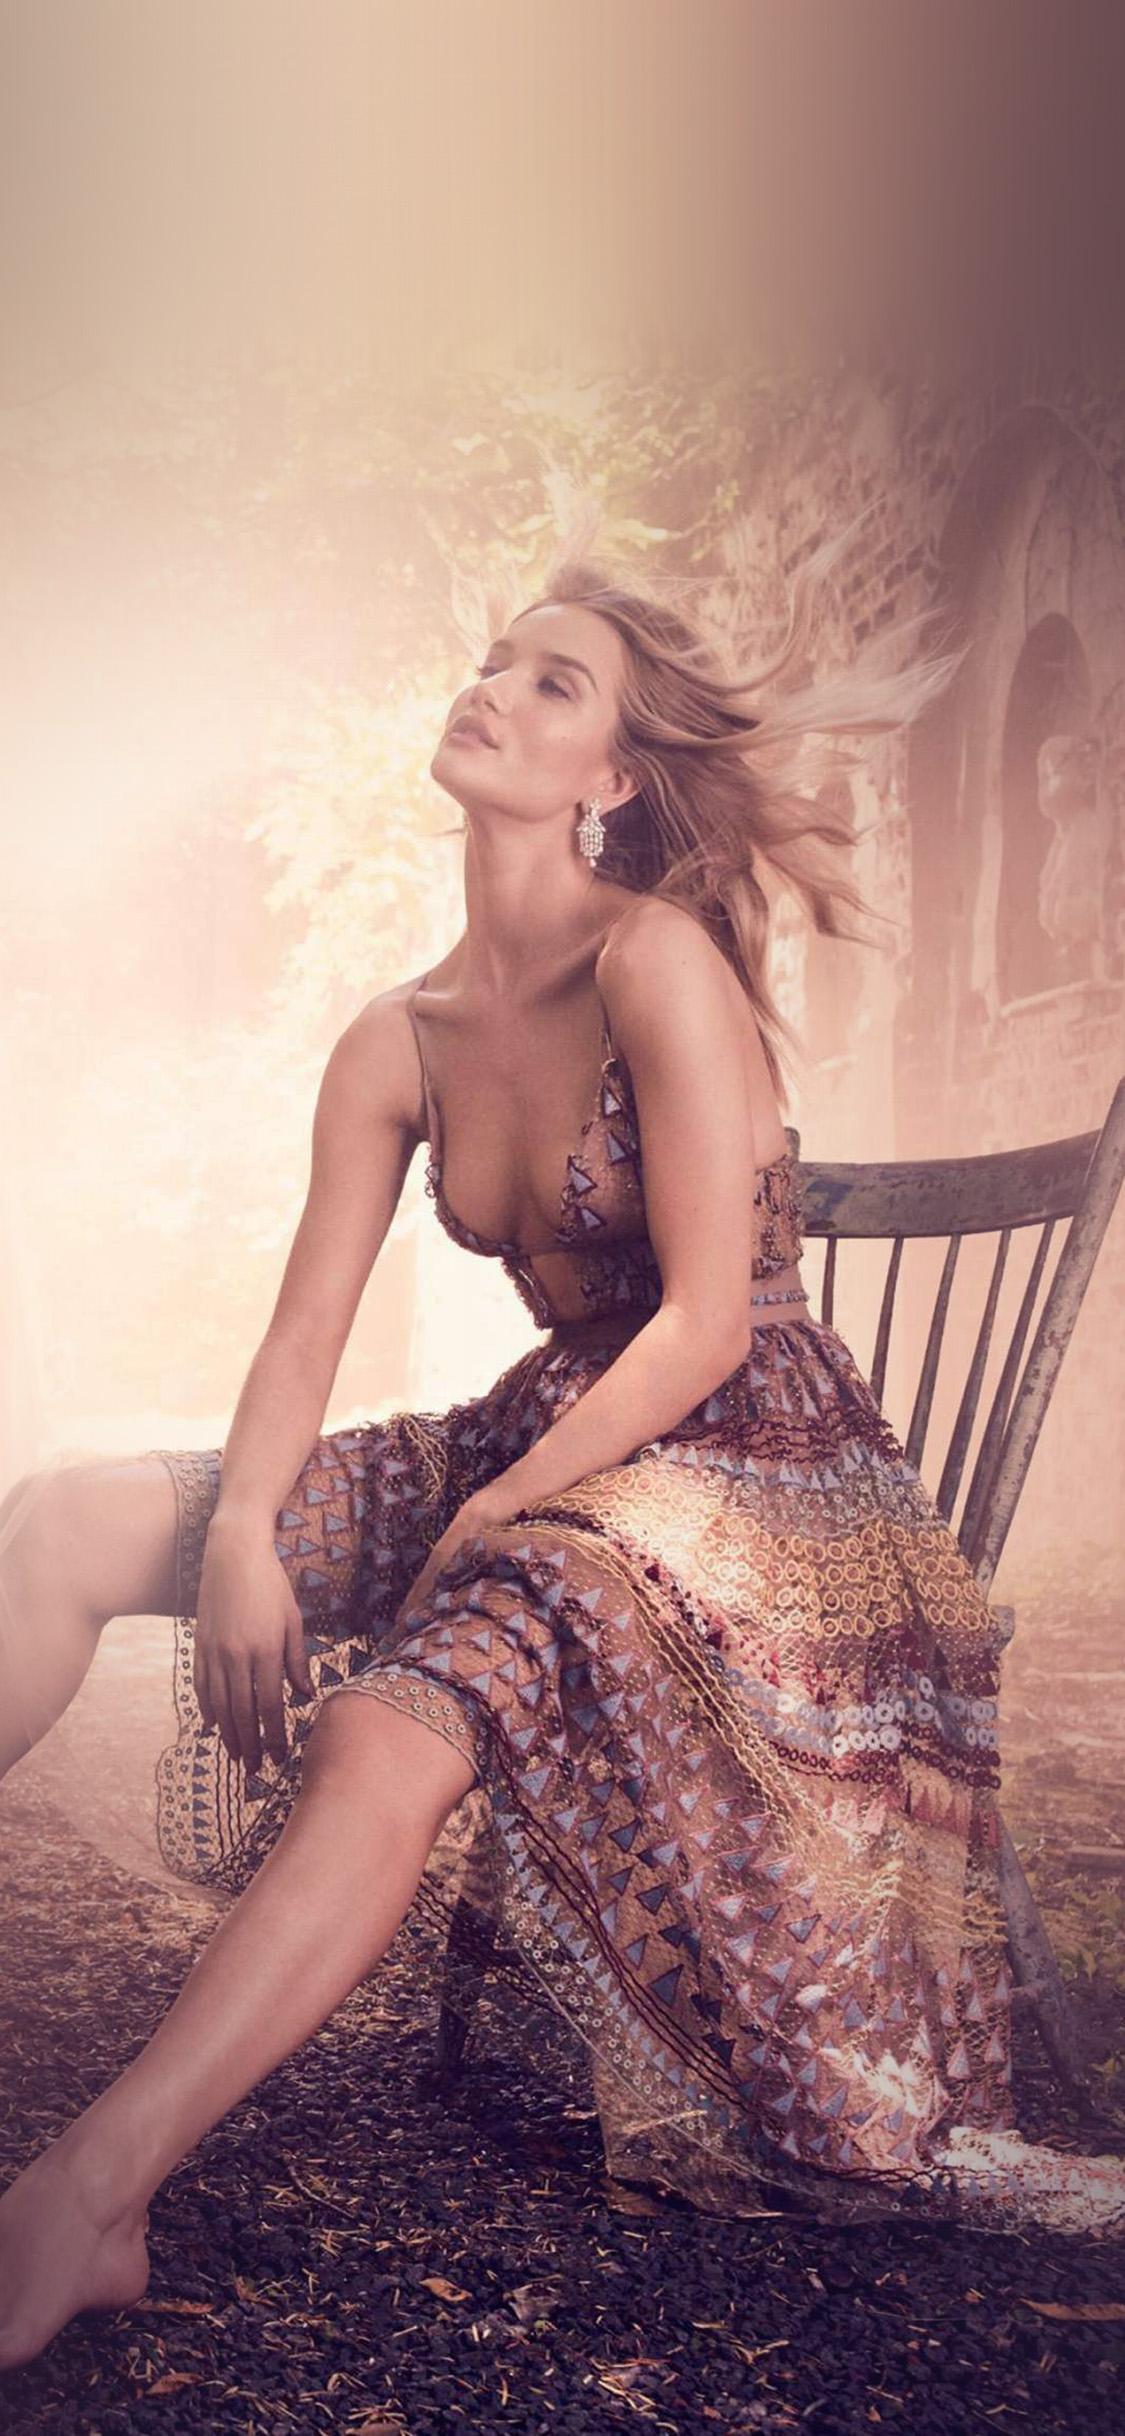 iPhonexpapers.com-Apple-iPhone-wallpaper-hr95-rosie-huntington-model-girl-victoria